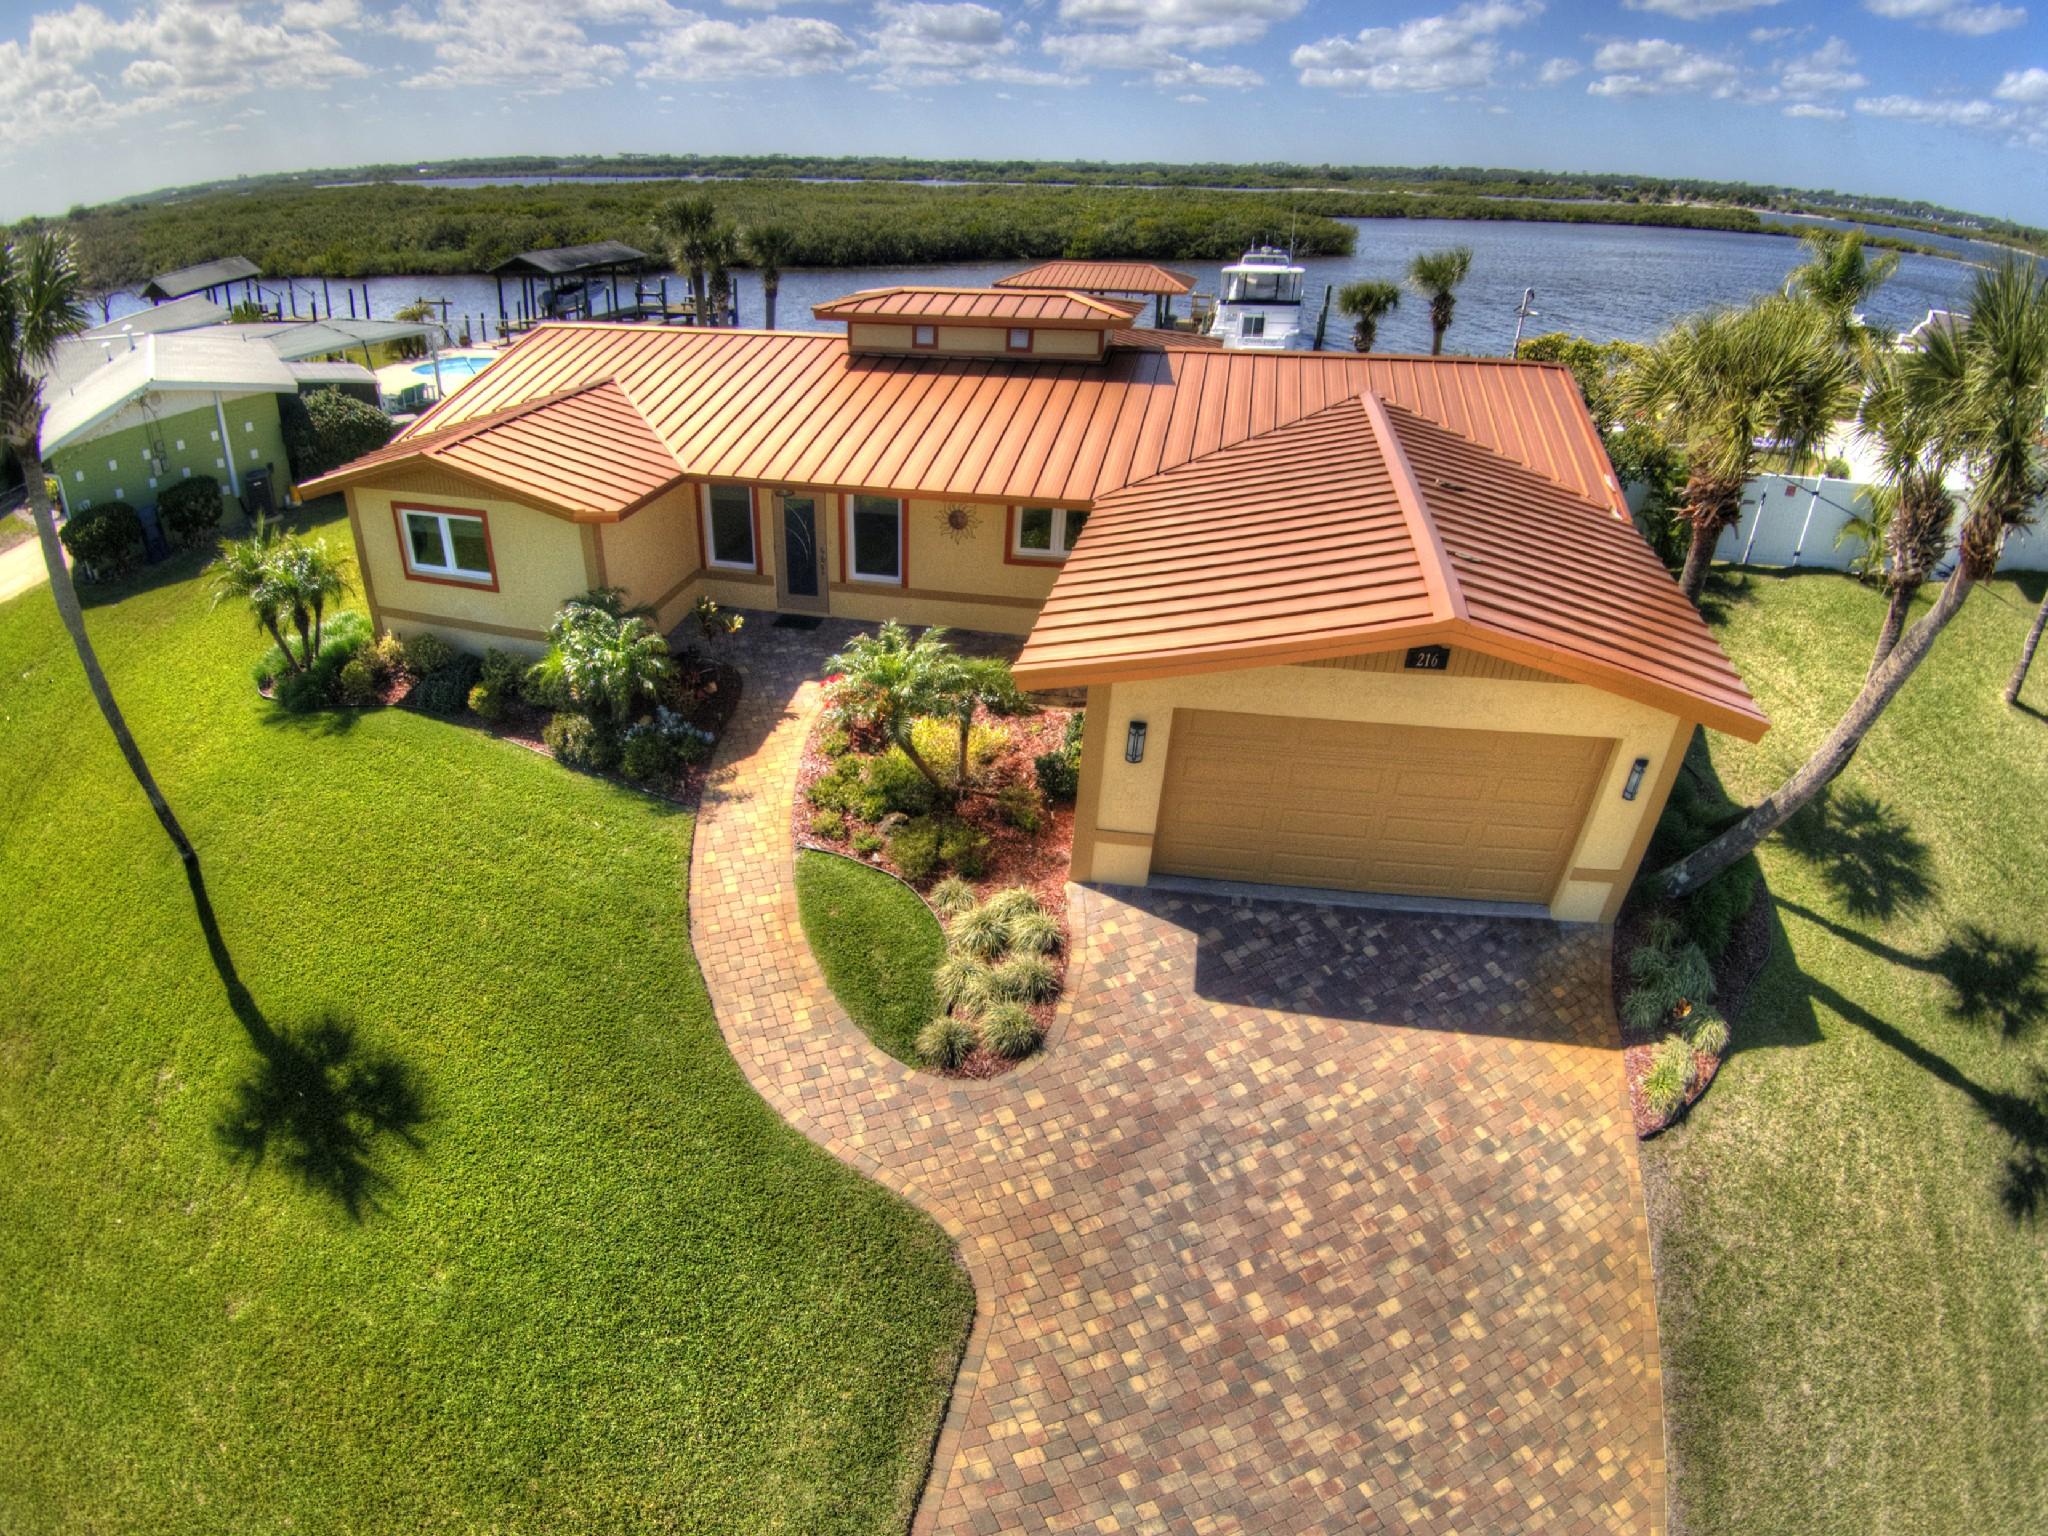 Single Family Home for Sale at Daytona Beach, Florida 216 S. Venetian Way Port Orange, Florida 32127 United States